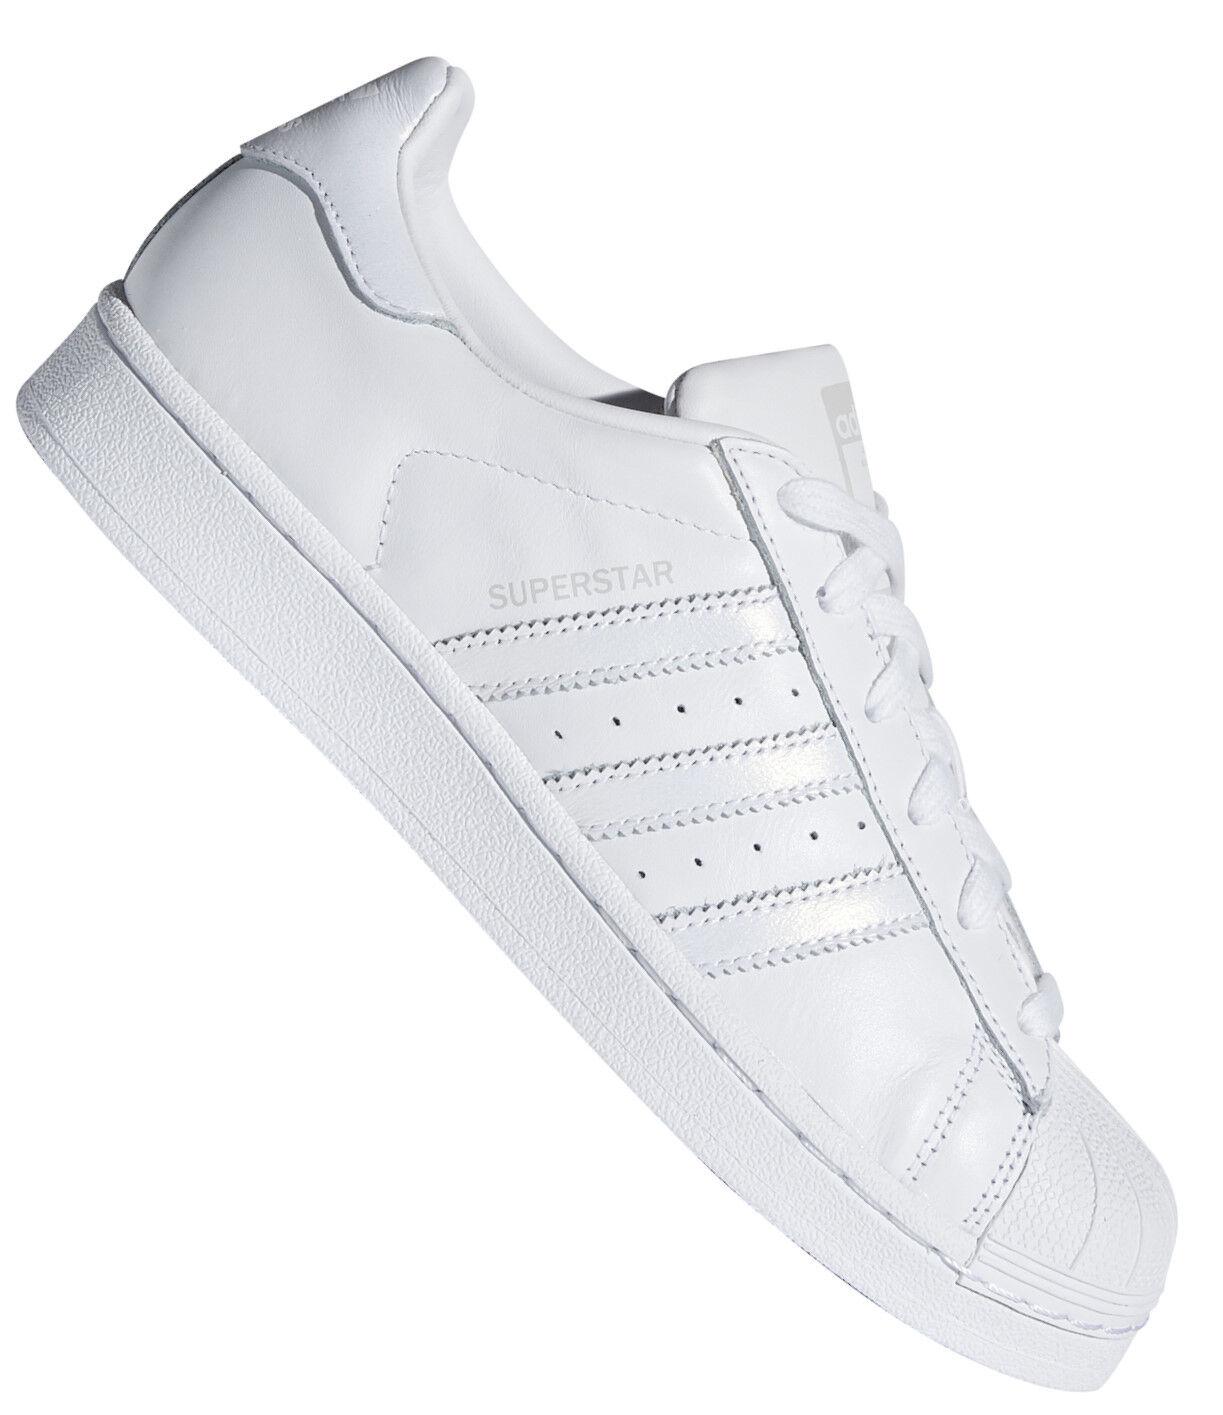 Adidas Superstar Damen Turnschuh weiß/silber Sneaker weiß/silber Turnschuh 0a1eb6